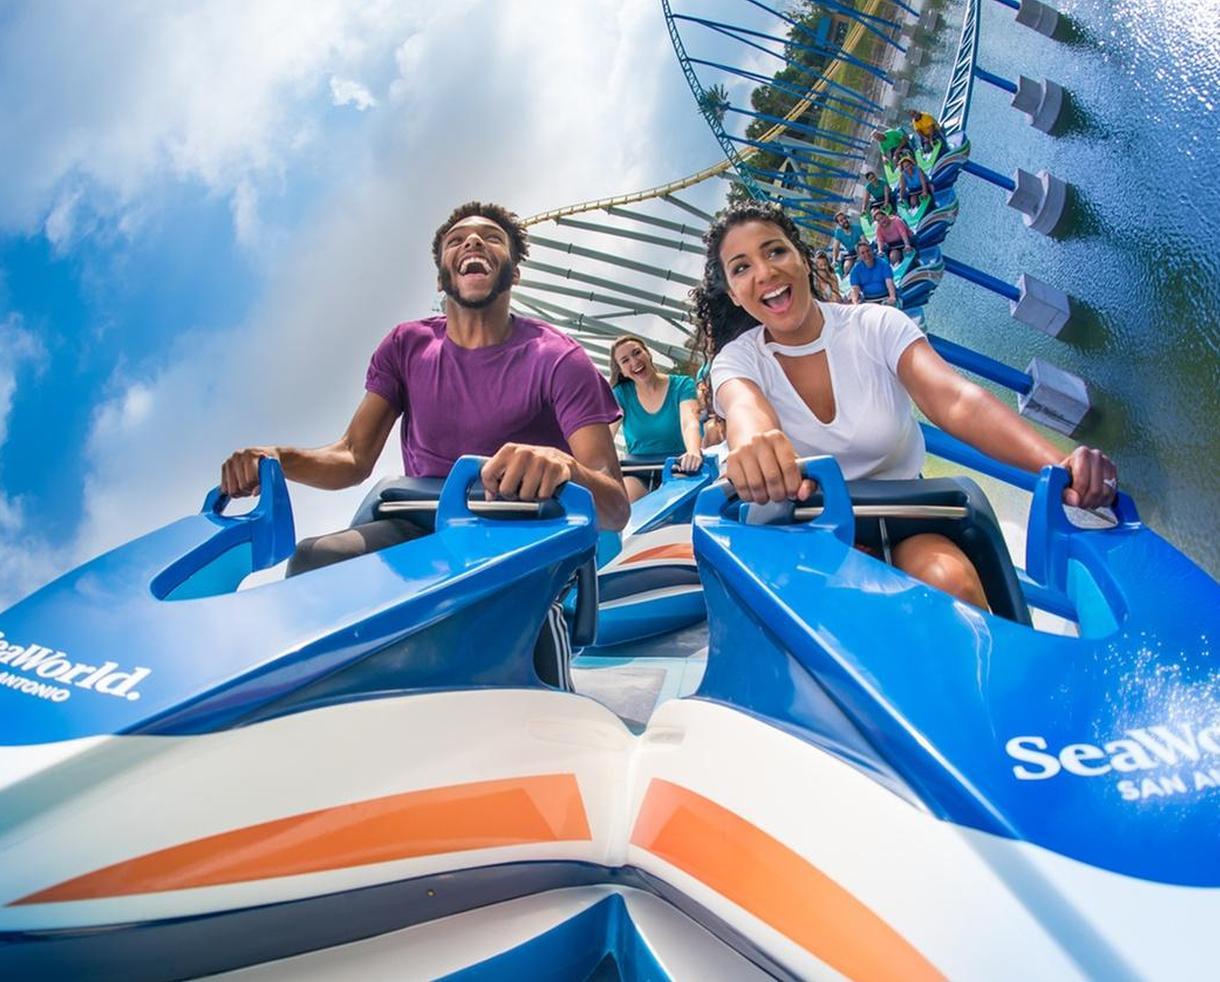 SeaWorld and Aquatica San Antonio 5 Day Flex Ticket